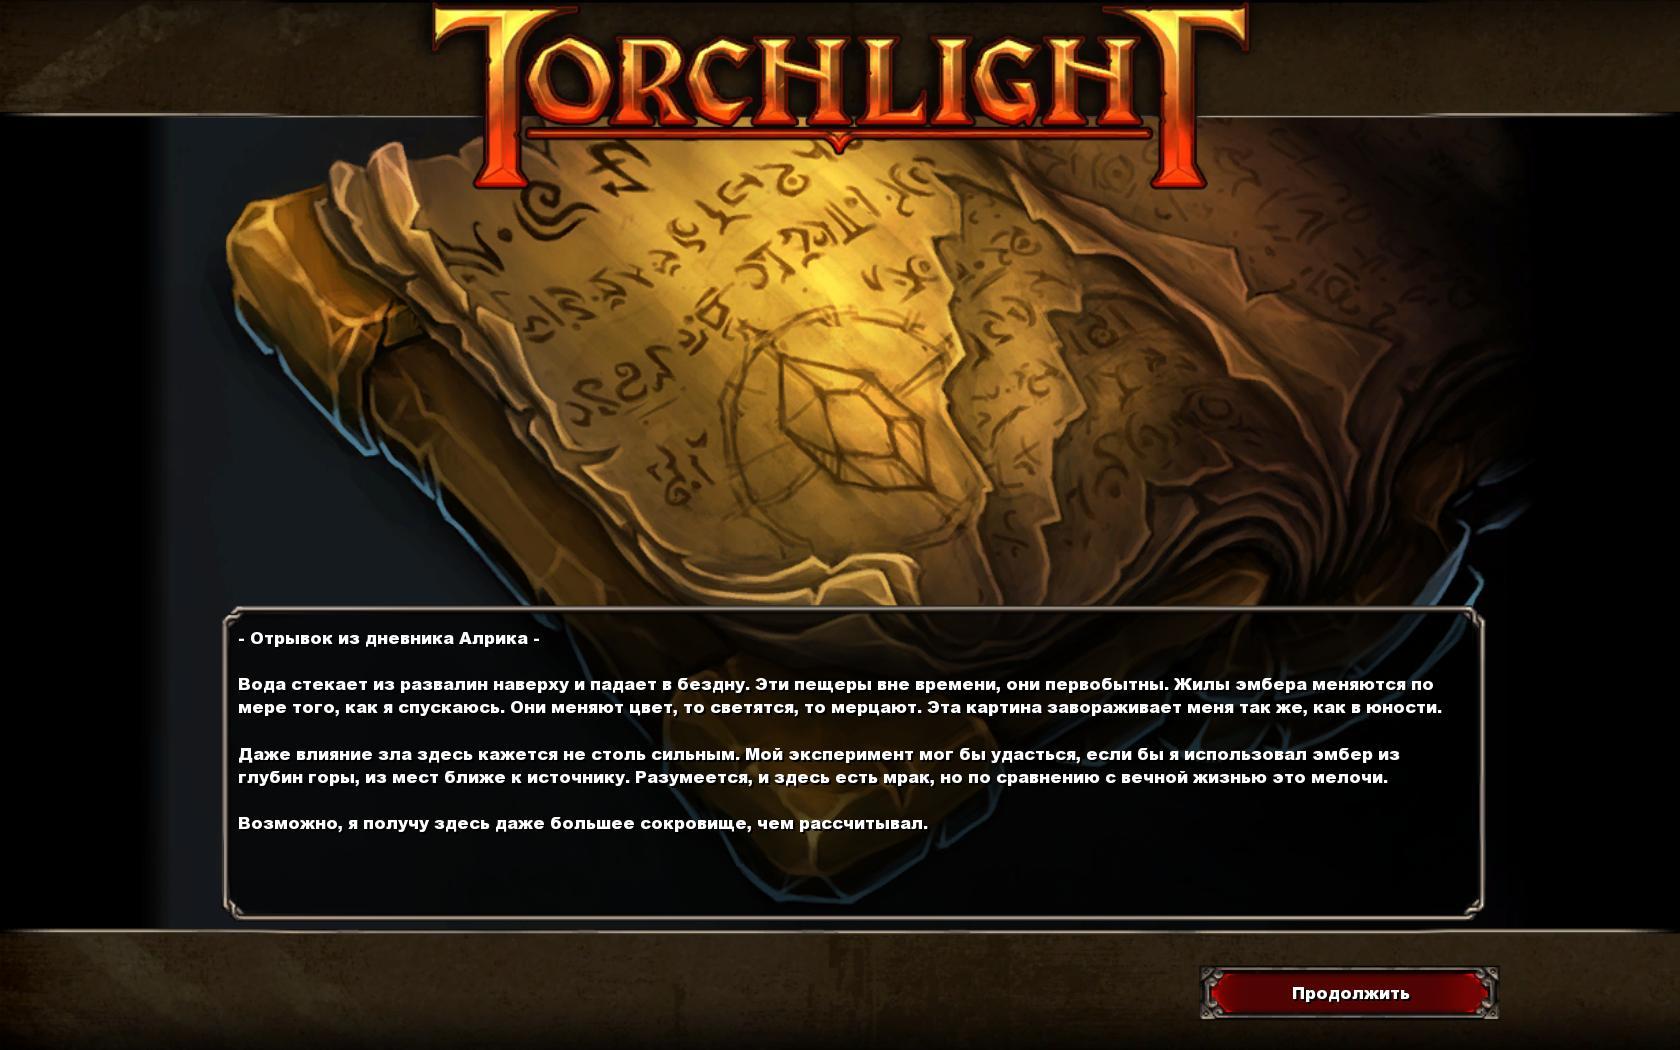 Torchlight forums gambling gambling productivity report